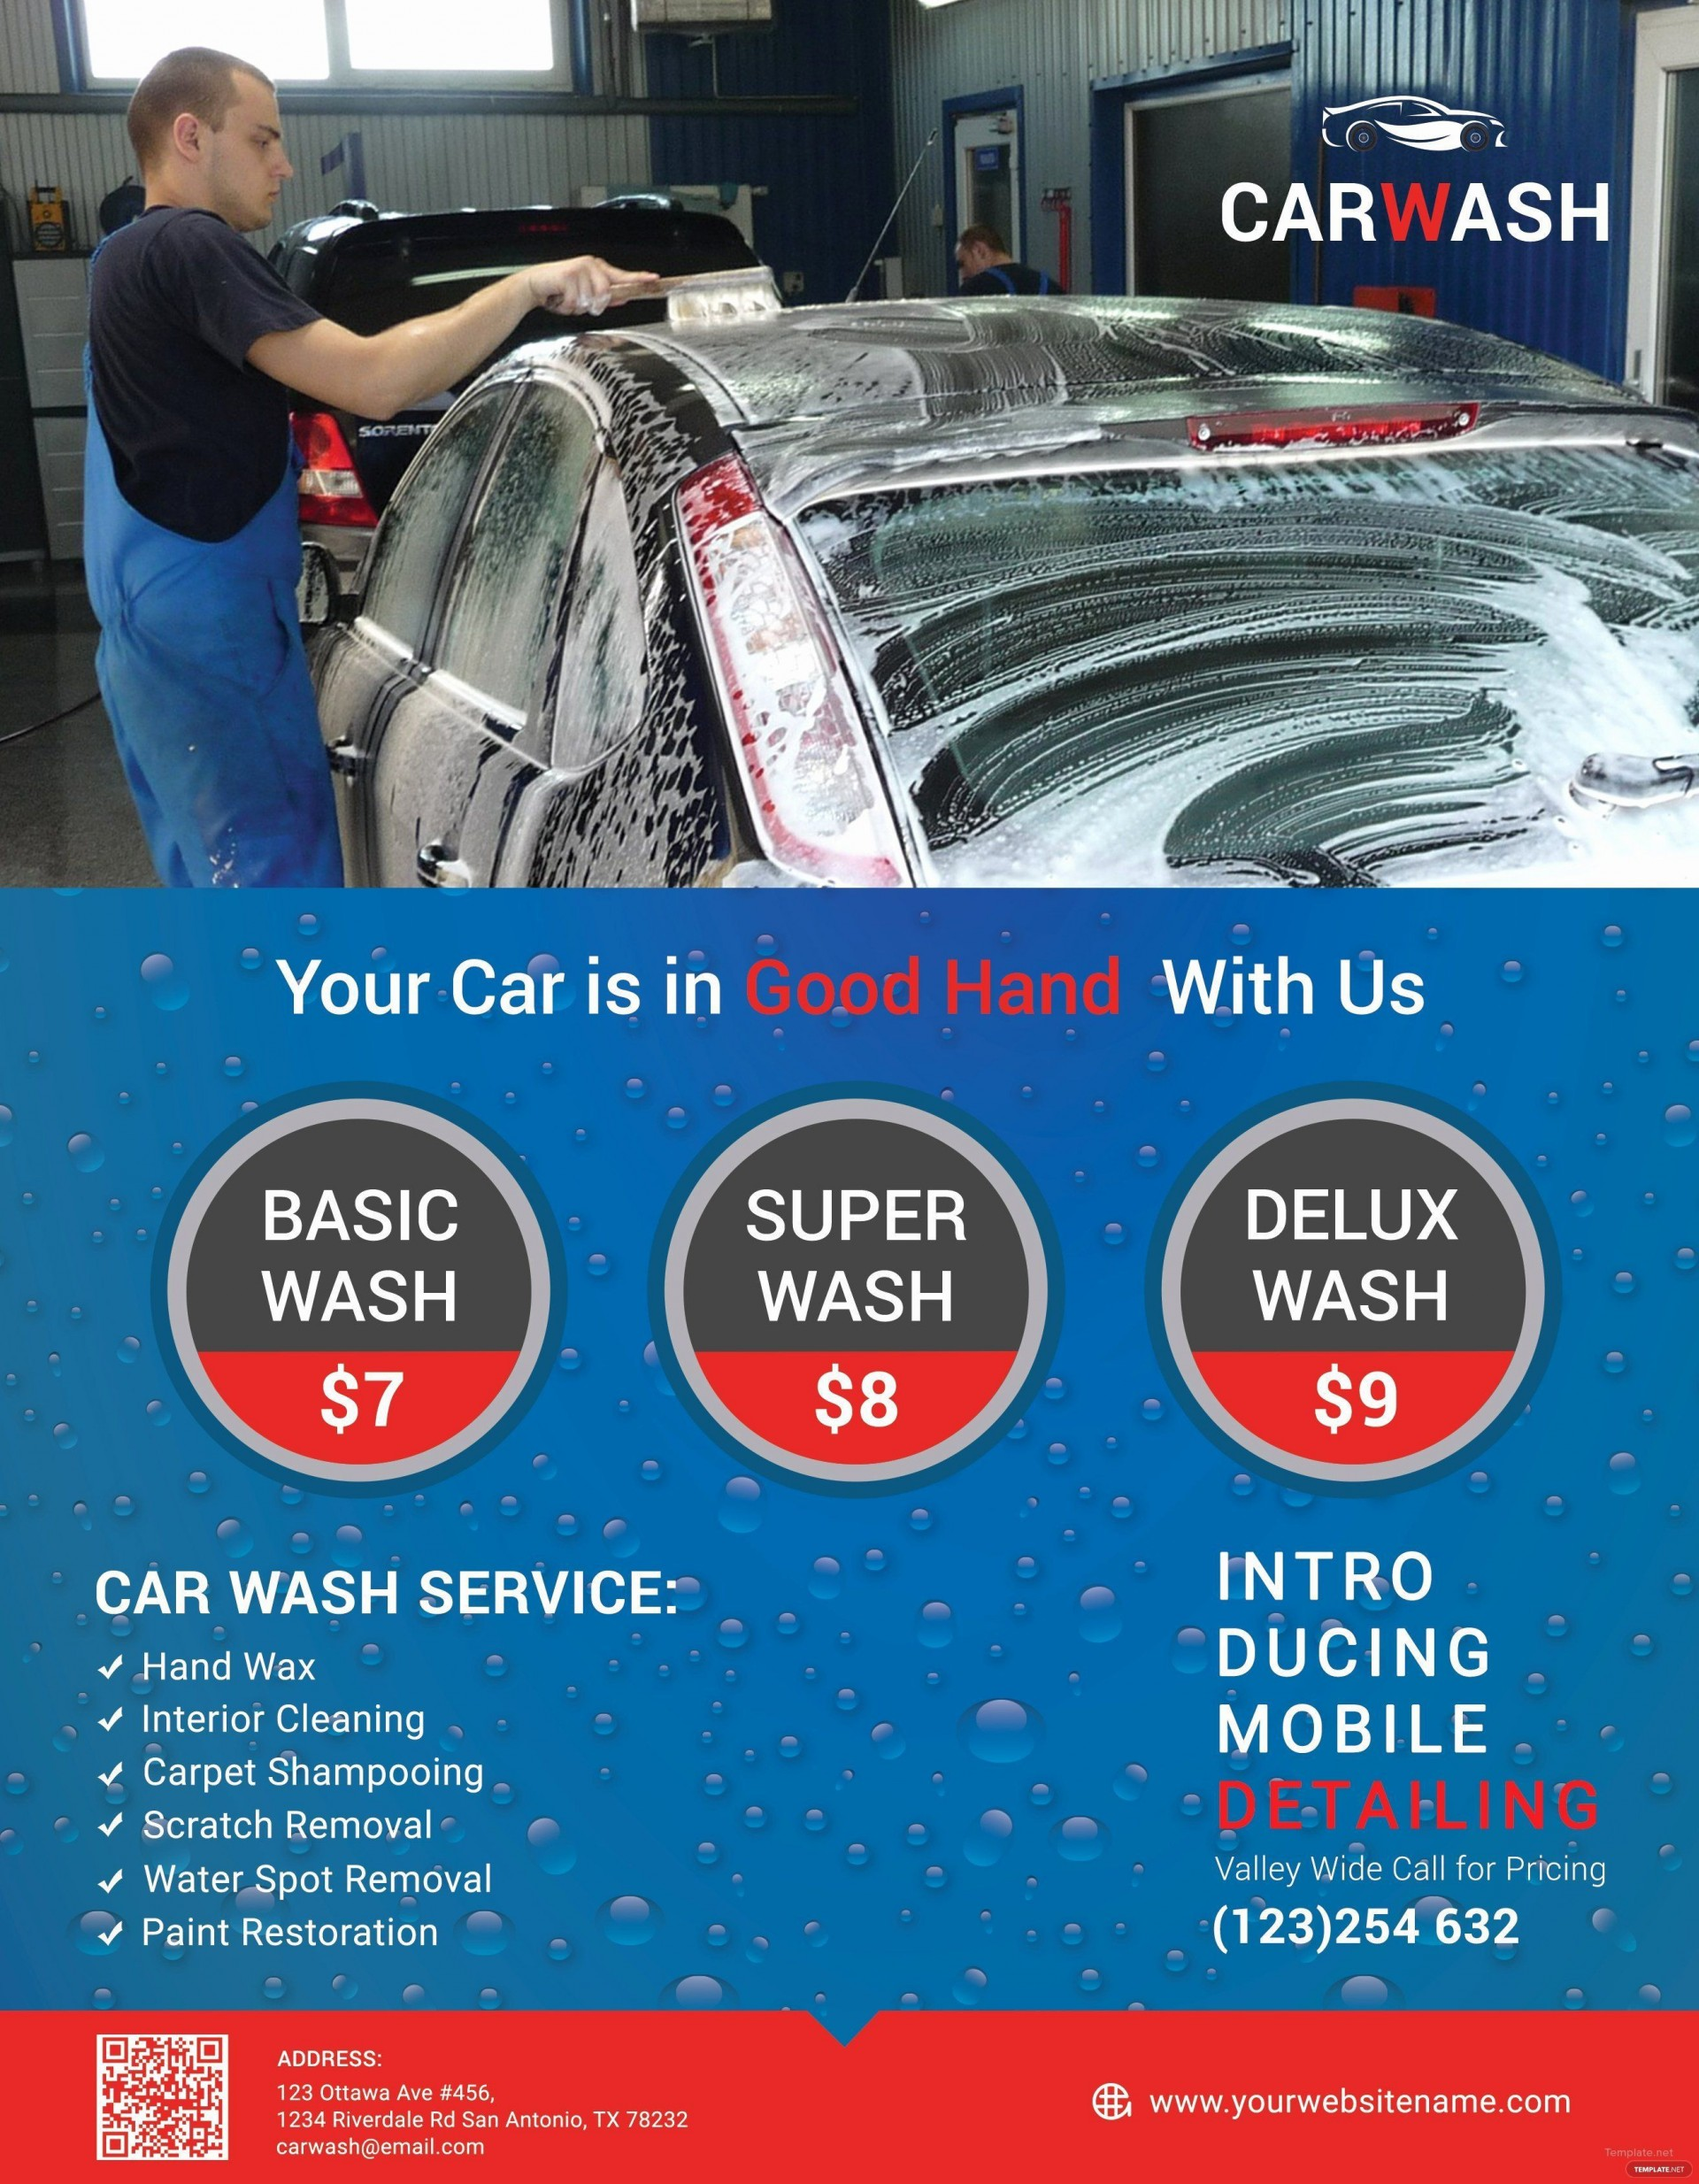 003 Best Car Wash Flyer Template Idea  Free Fundraiser Download1920